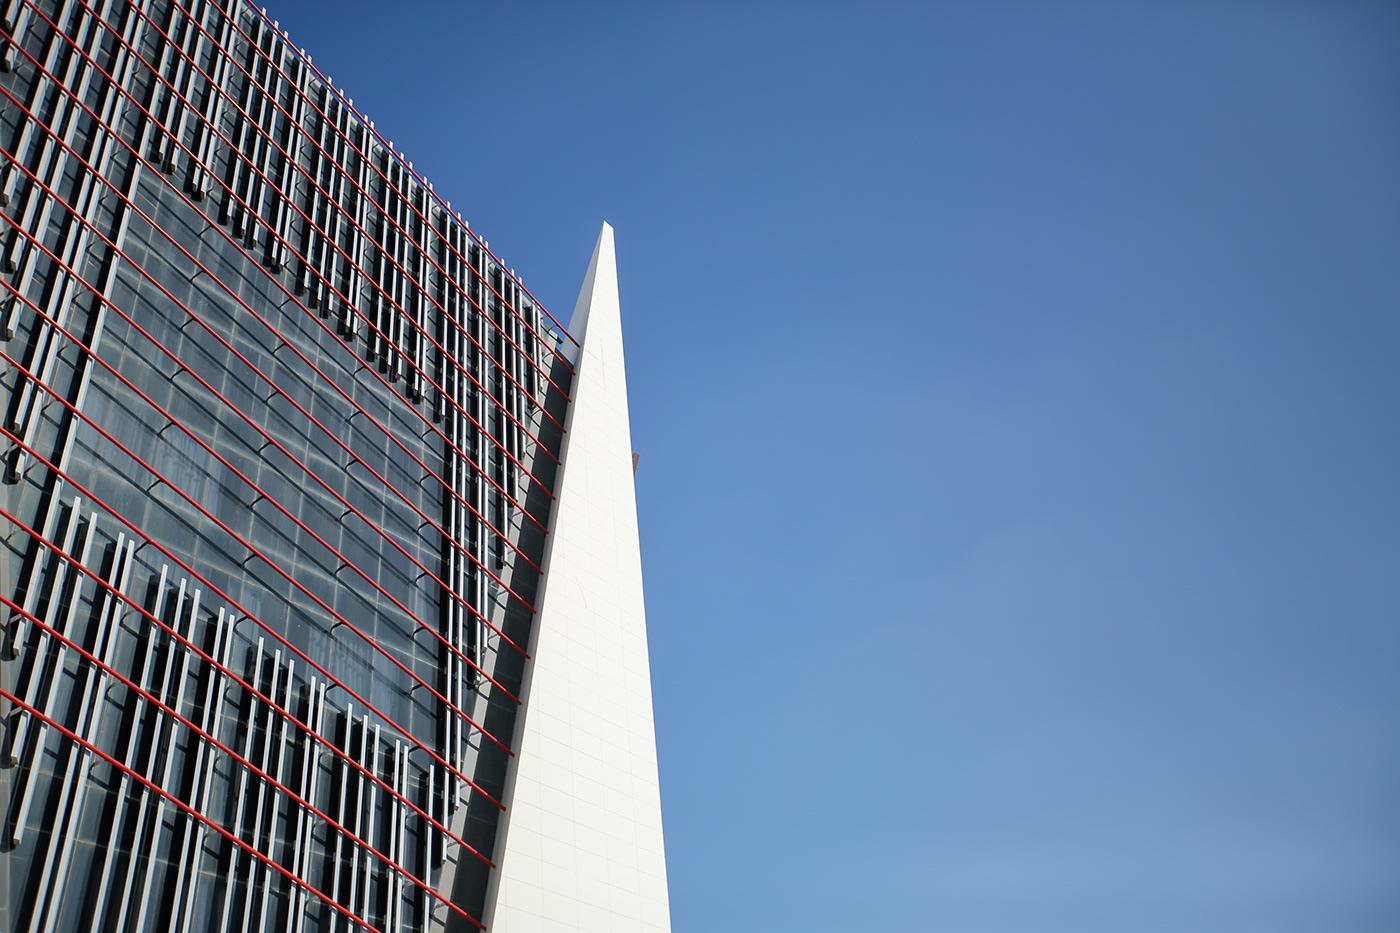 Qatar doha modern architecture towers buildings